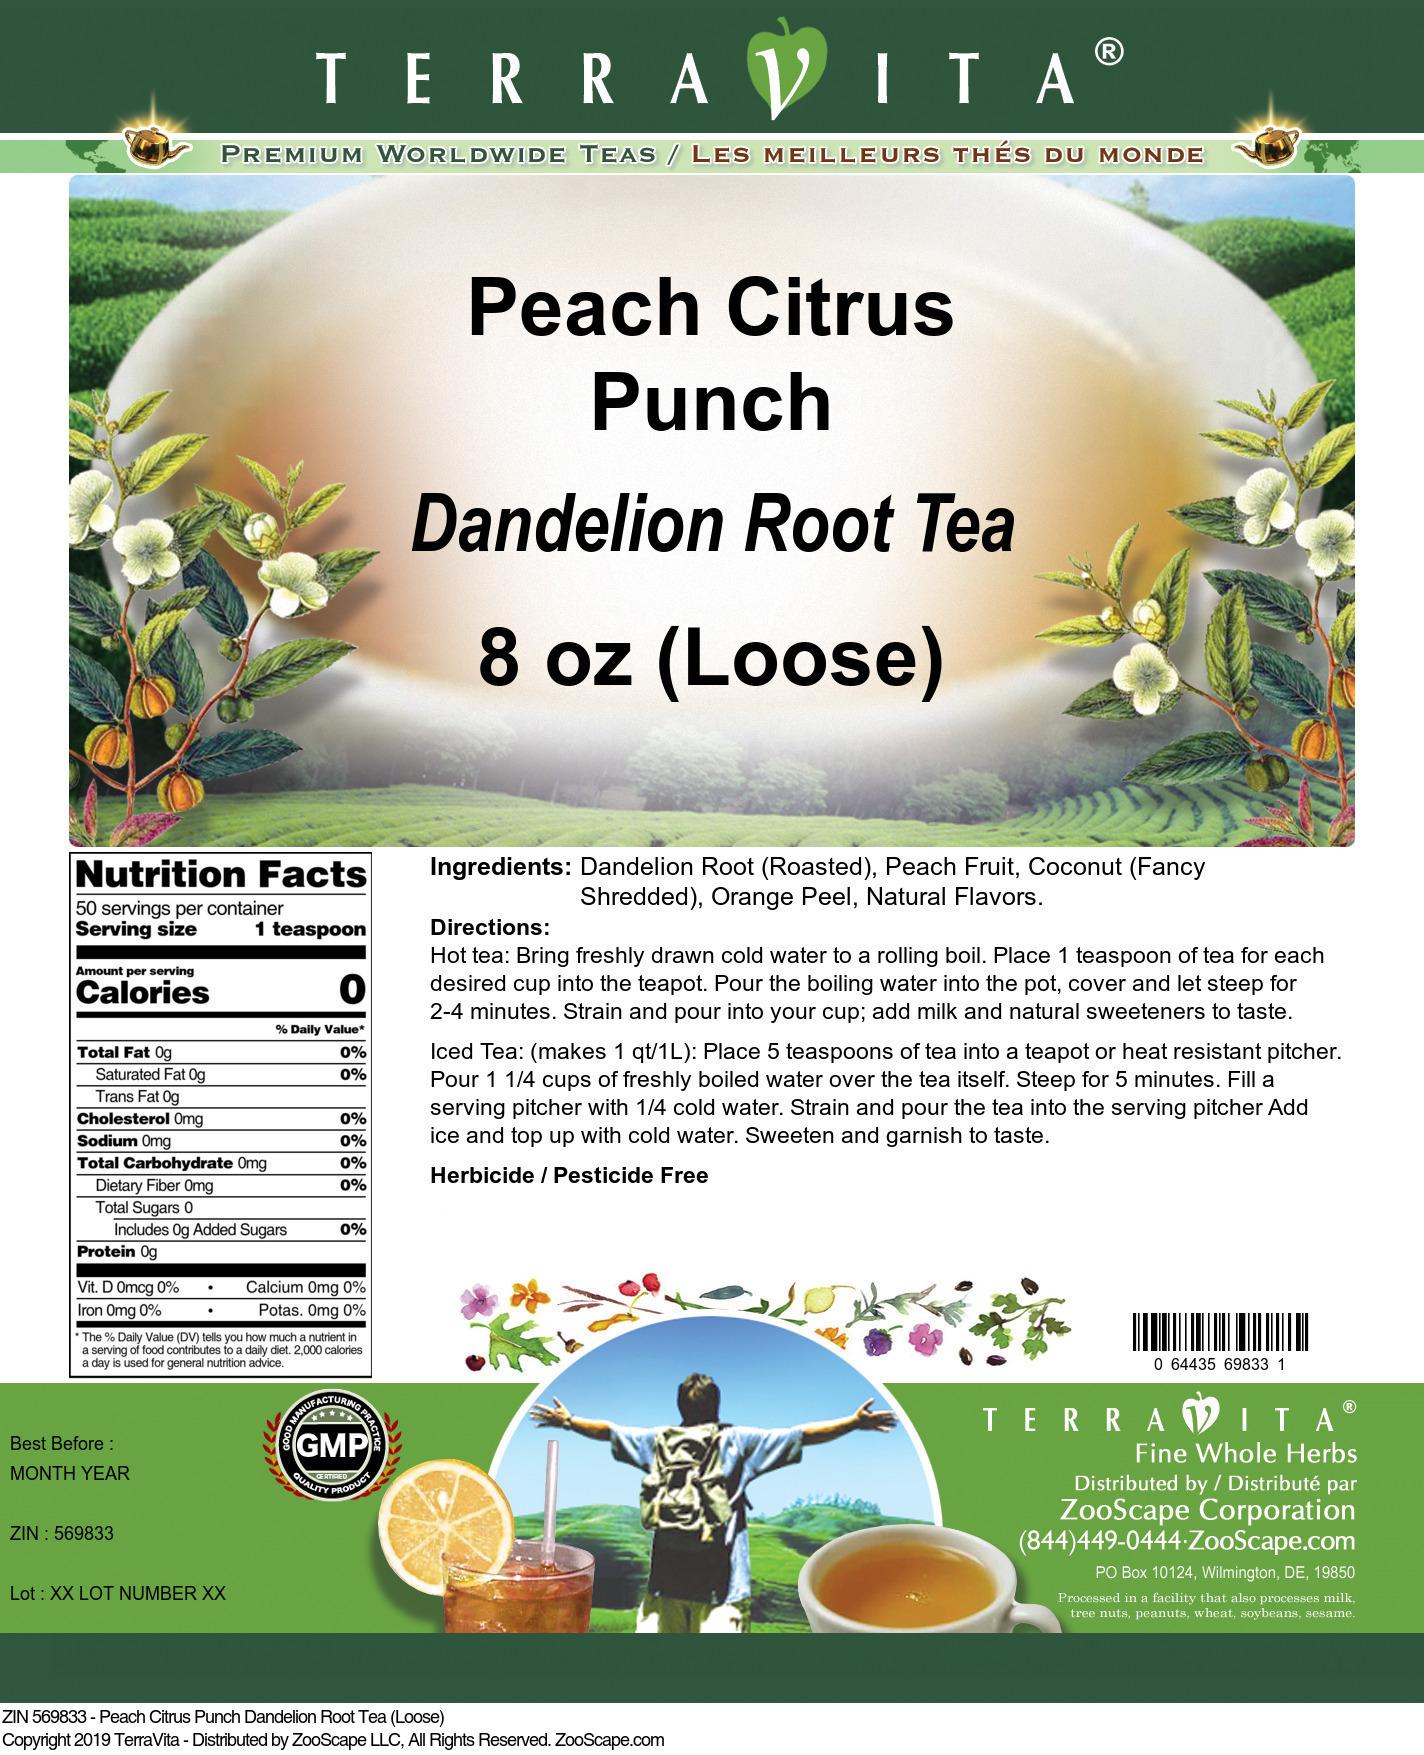 Peach Citrus Punch Dandelion Root